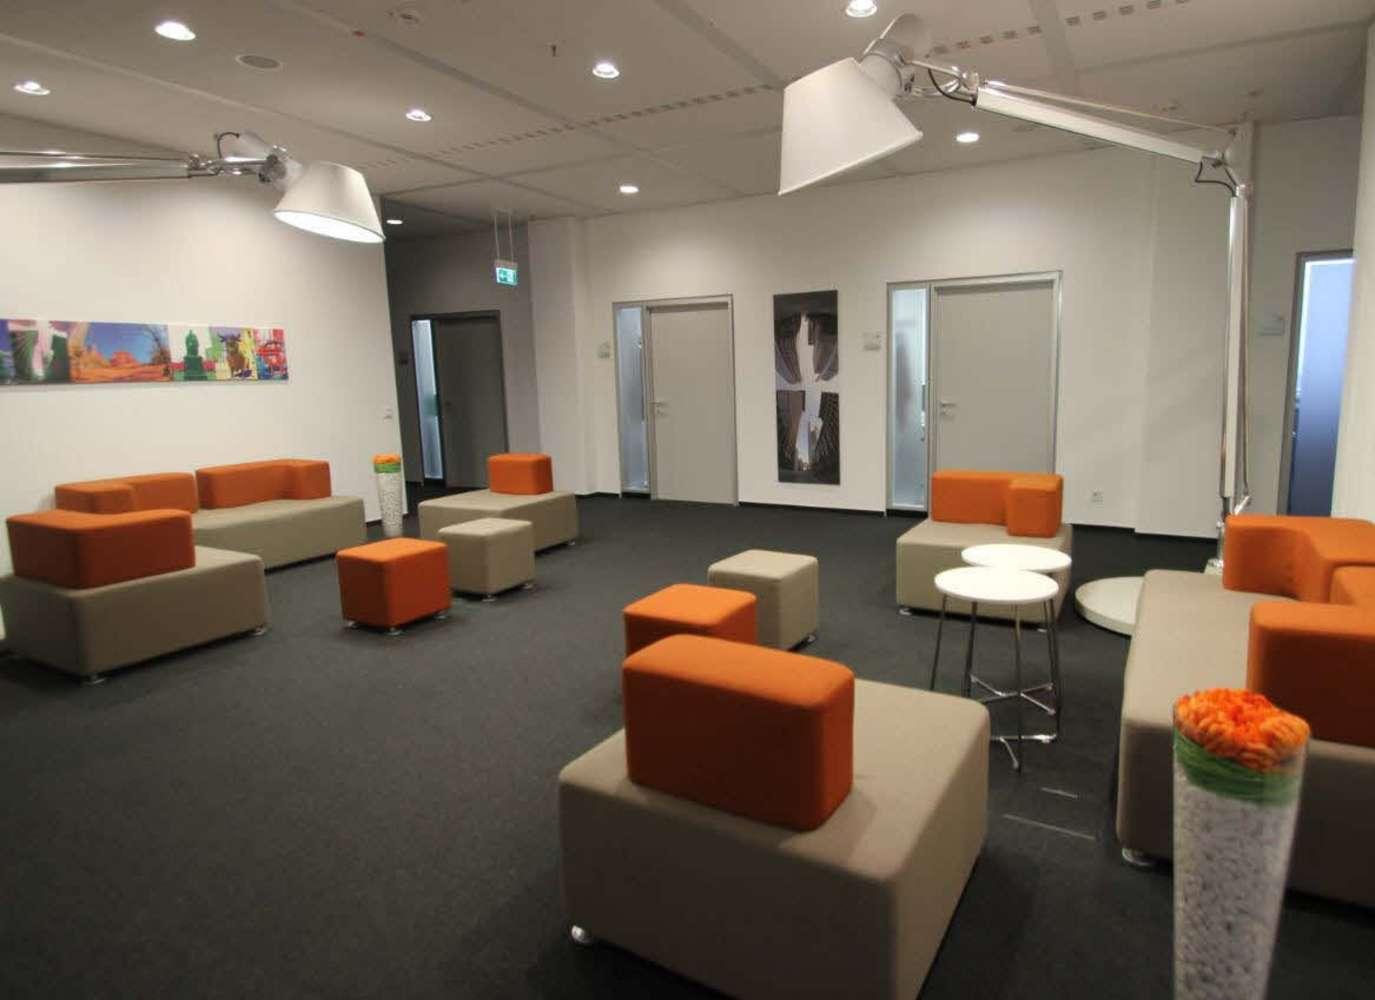 Büros Frankfurt am main, 60486 - Büro - Frankfurt am Main, Bockenheim - F0945 - 9836989